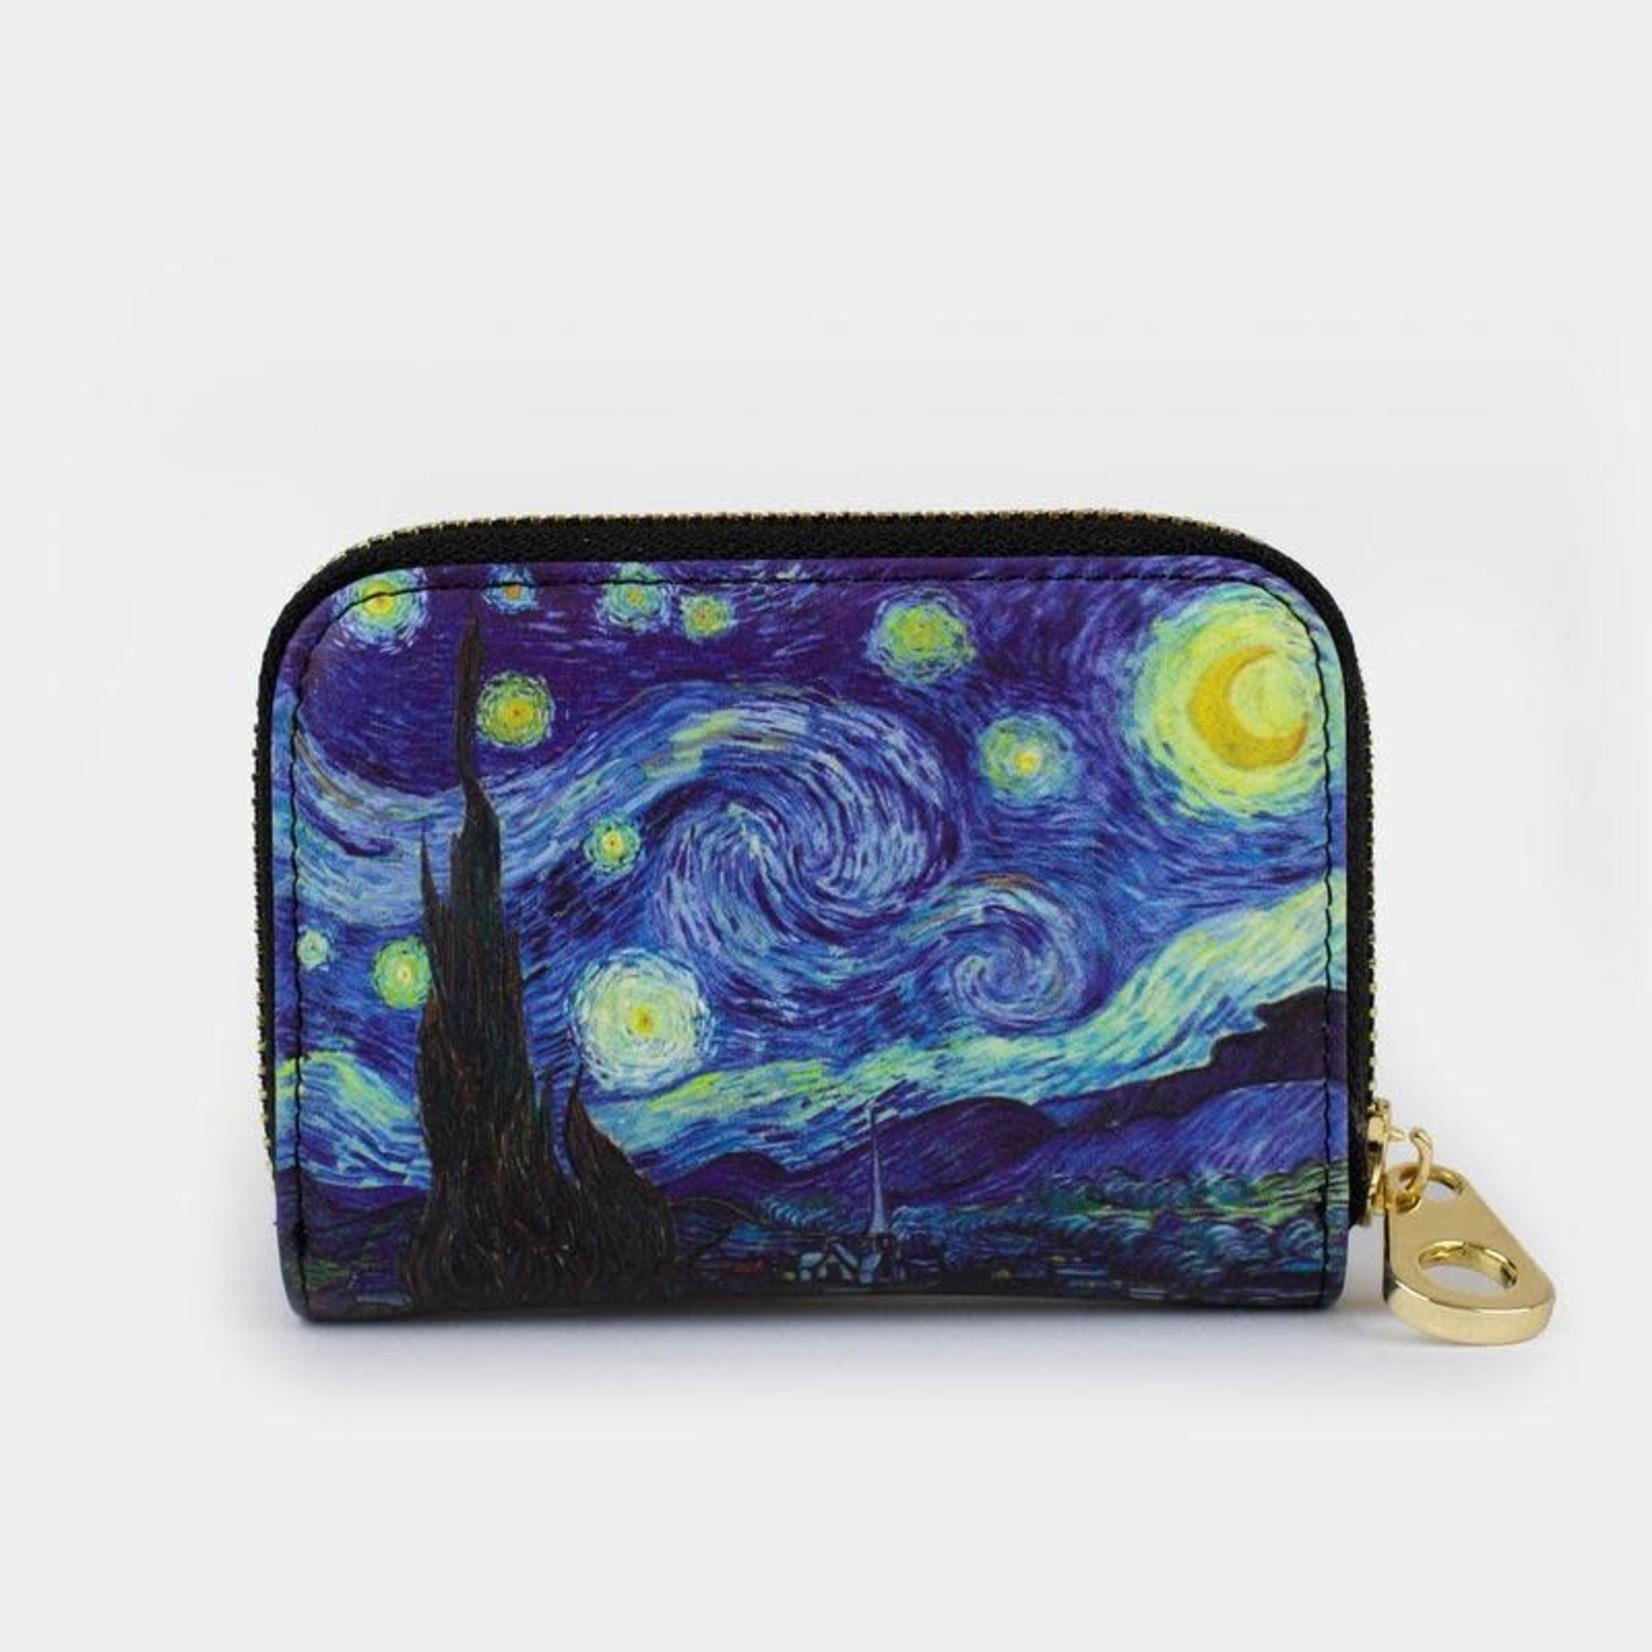 Monarque Zippered Wallet - Van Gogh - The Starry Night